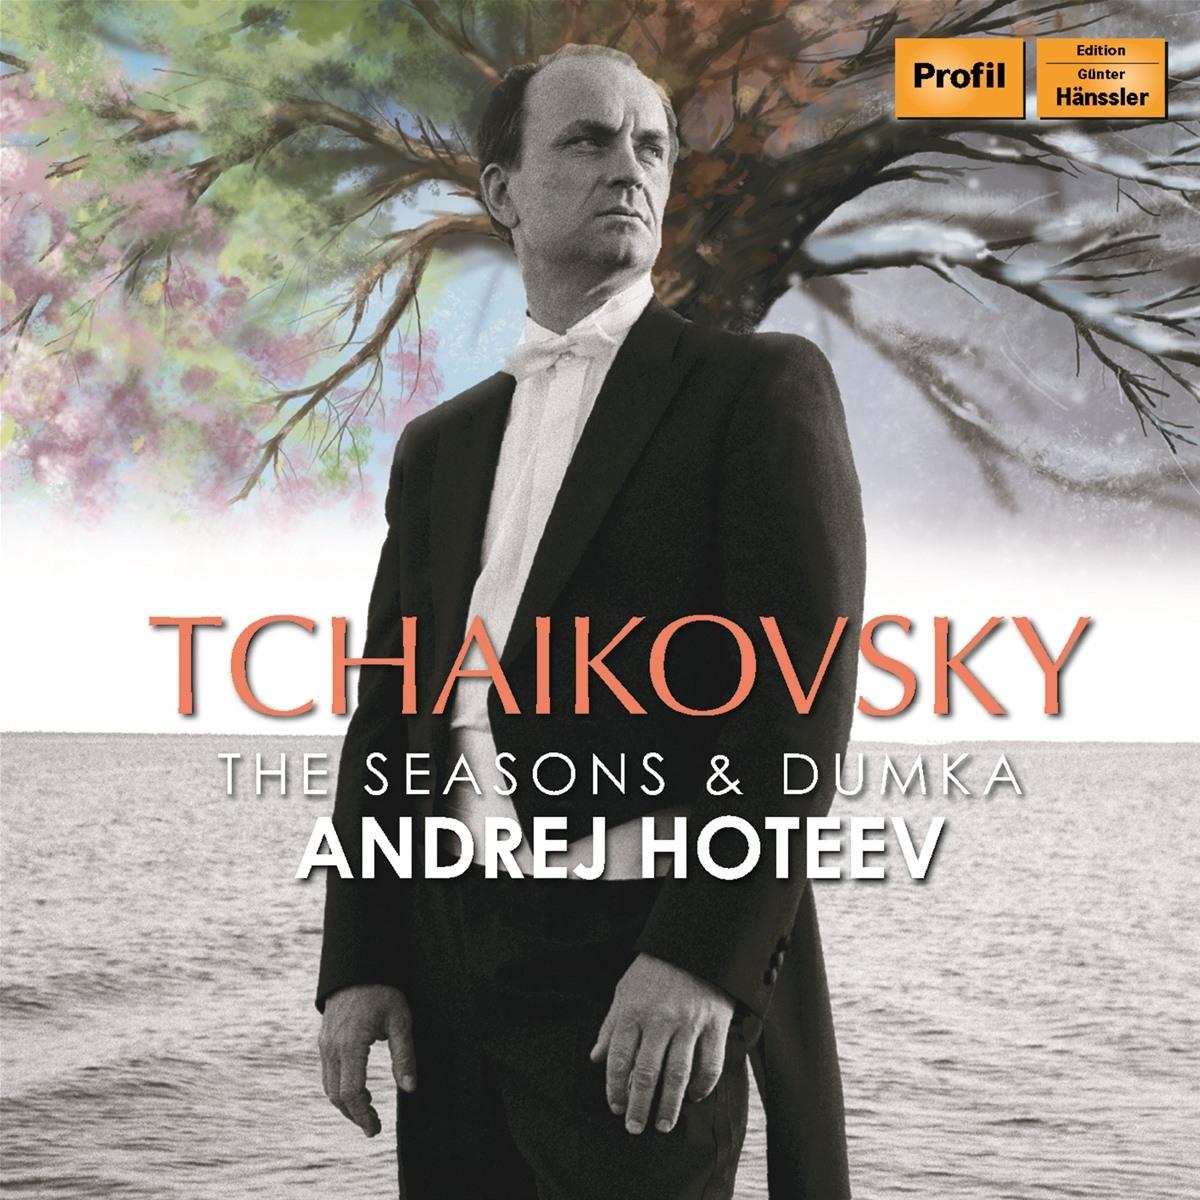 Tchaikovsky: Seasons & Dumka